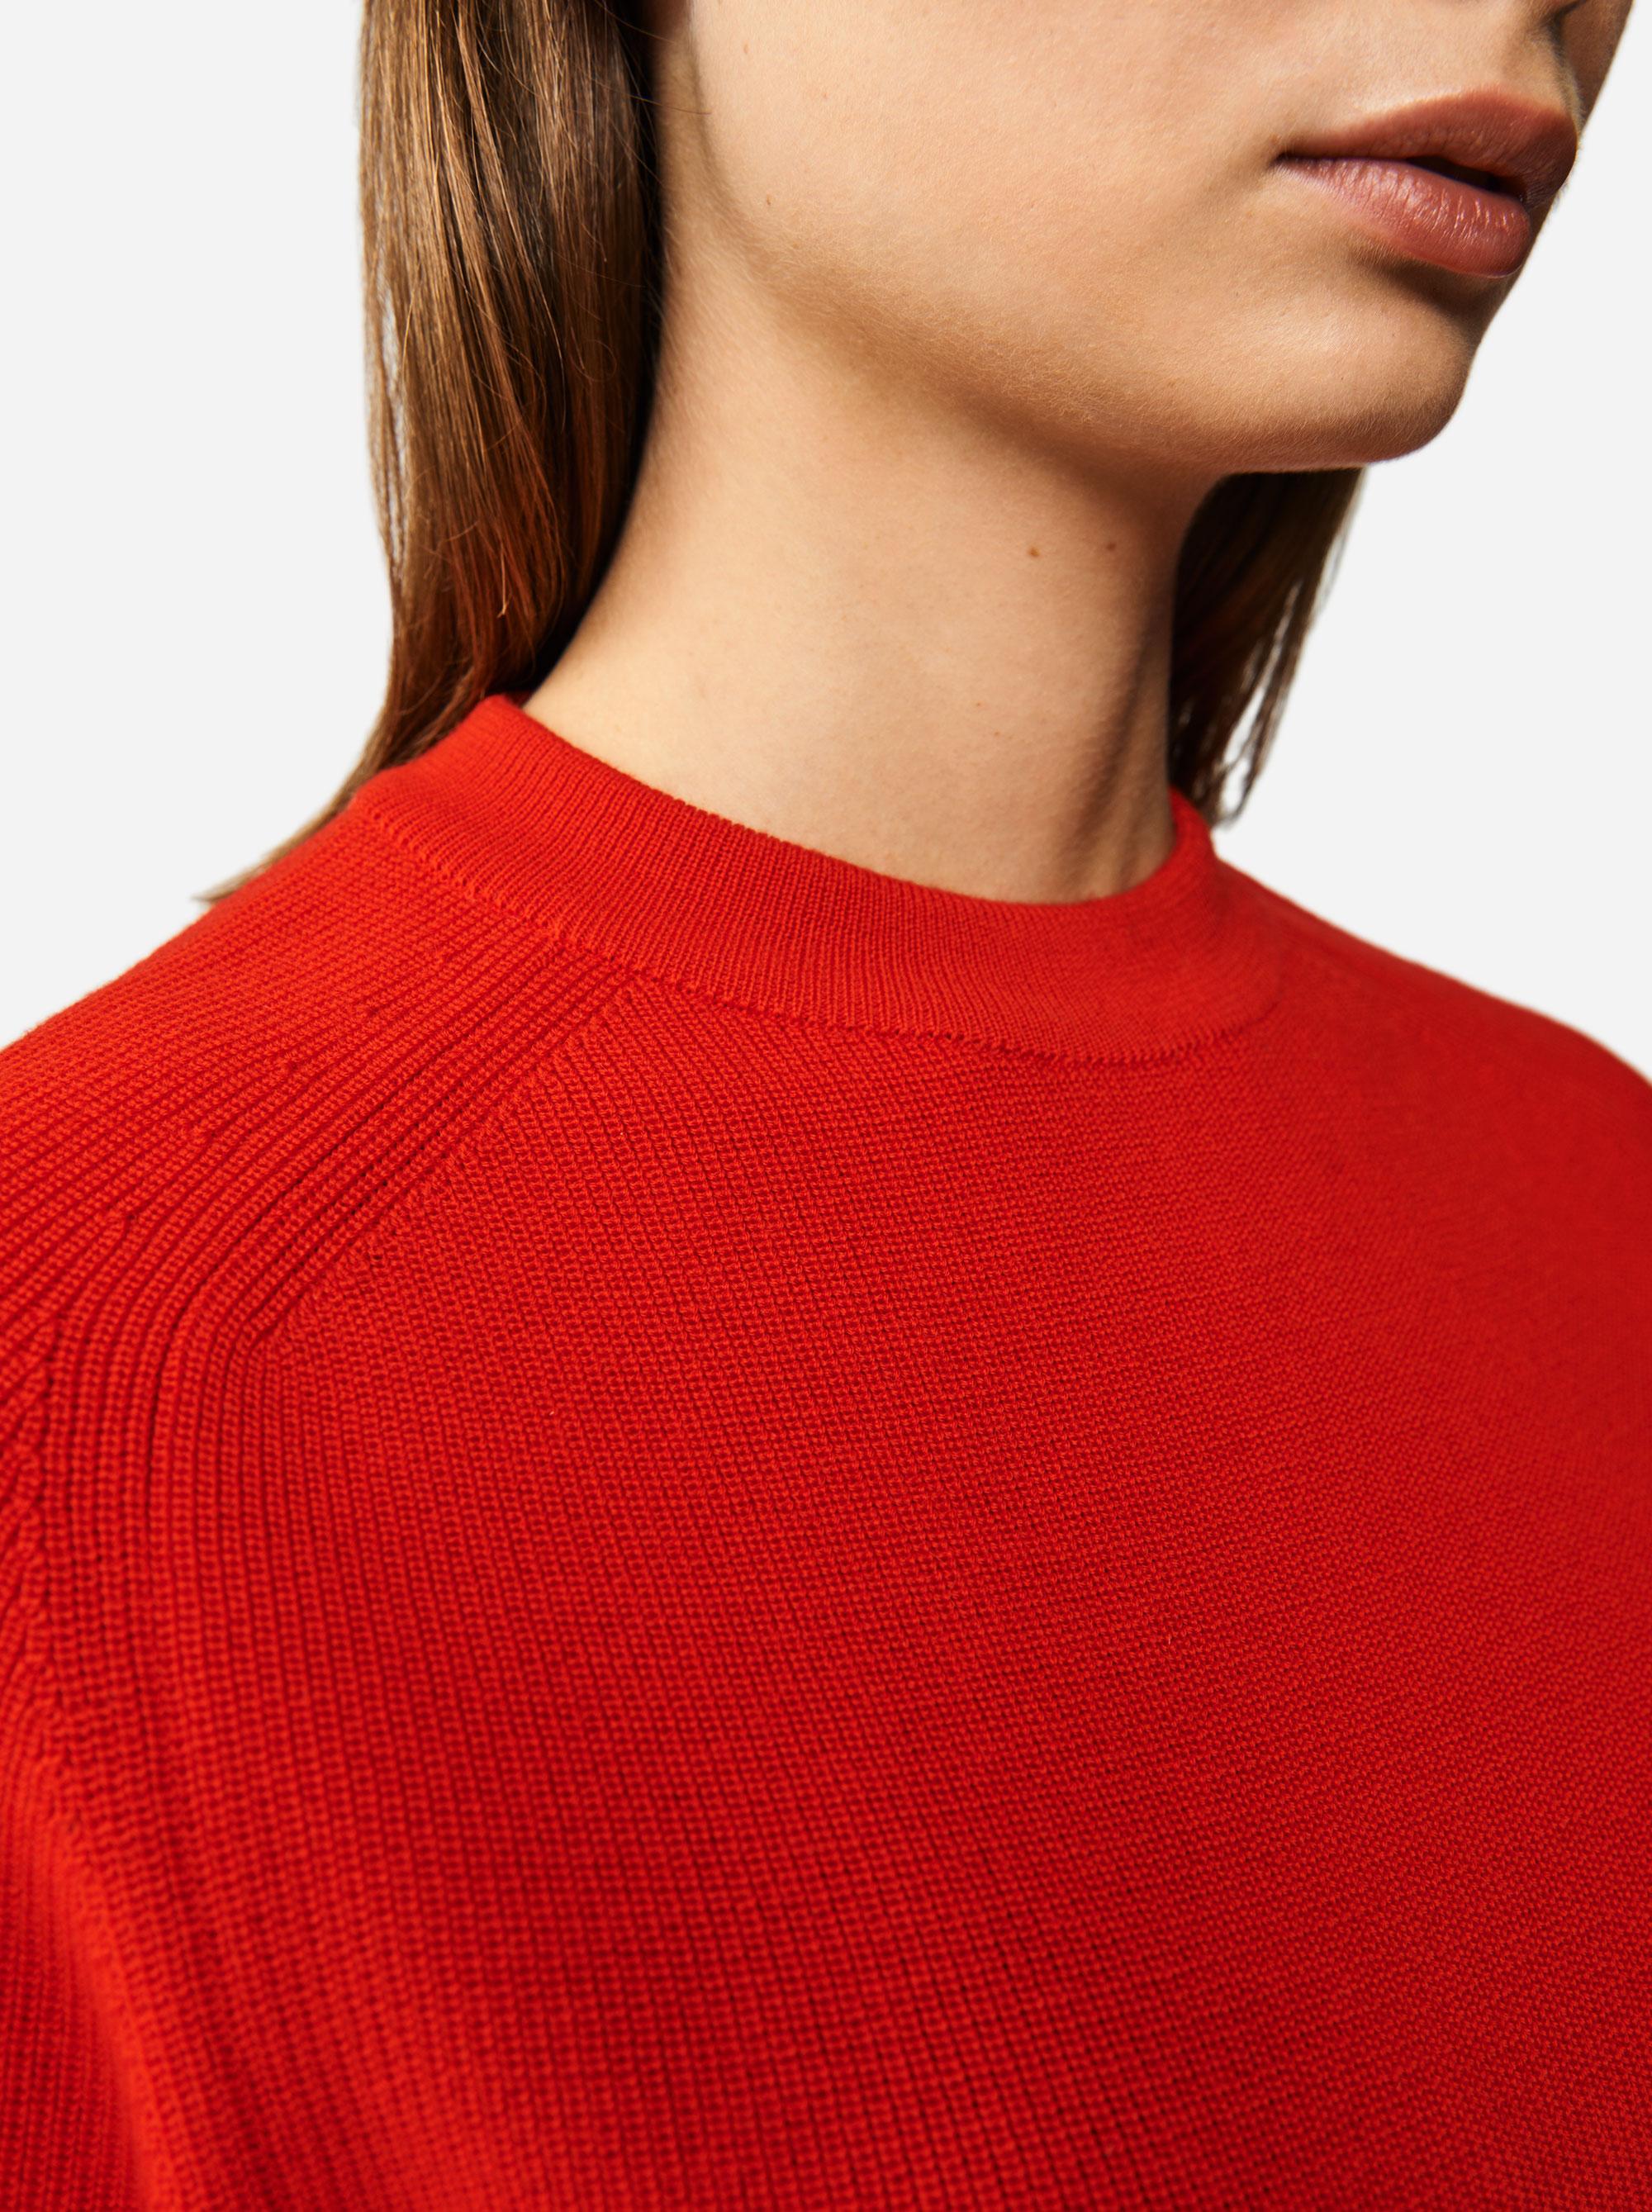 Teym - Crewneck - The Merino Sweater - Women - Red - 2